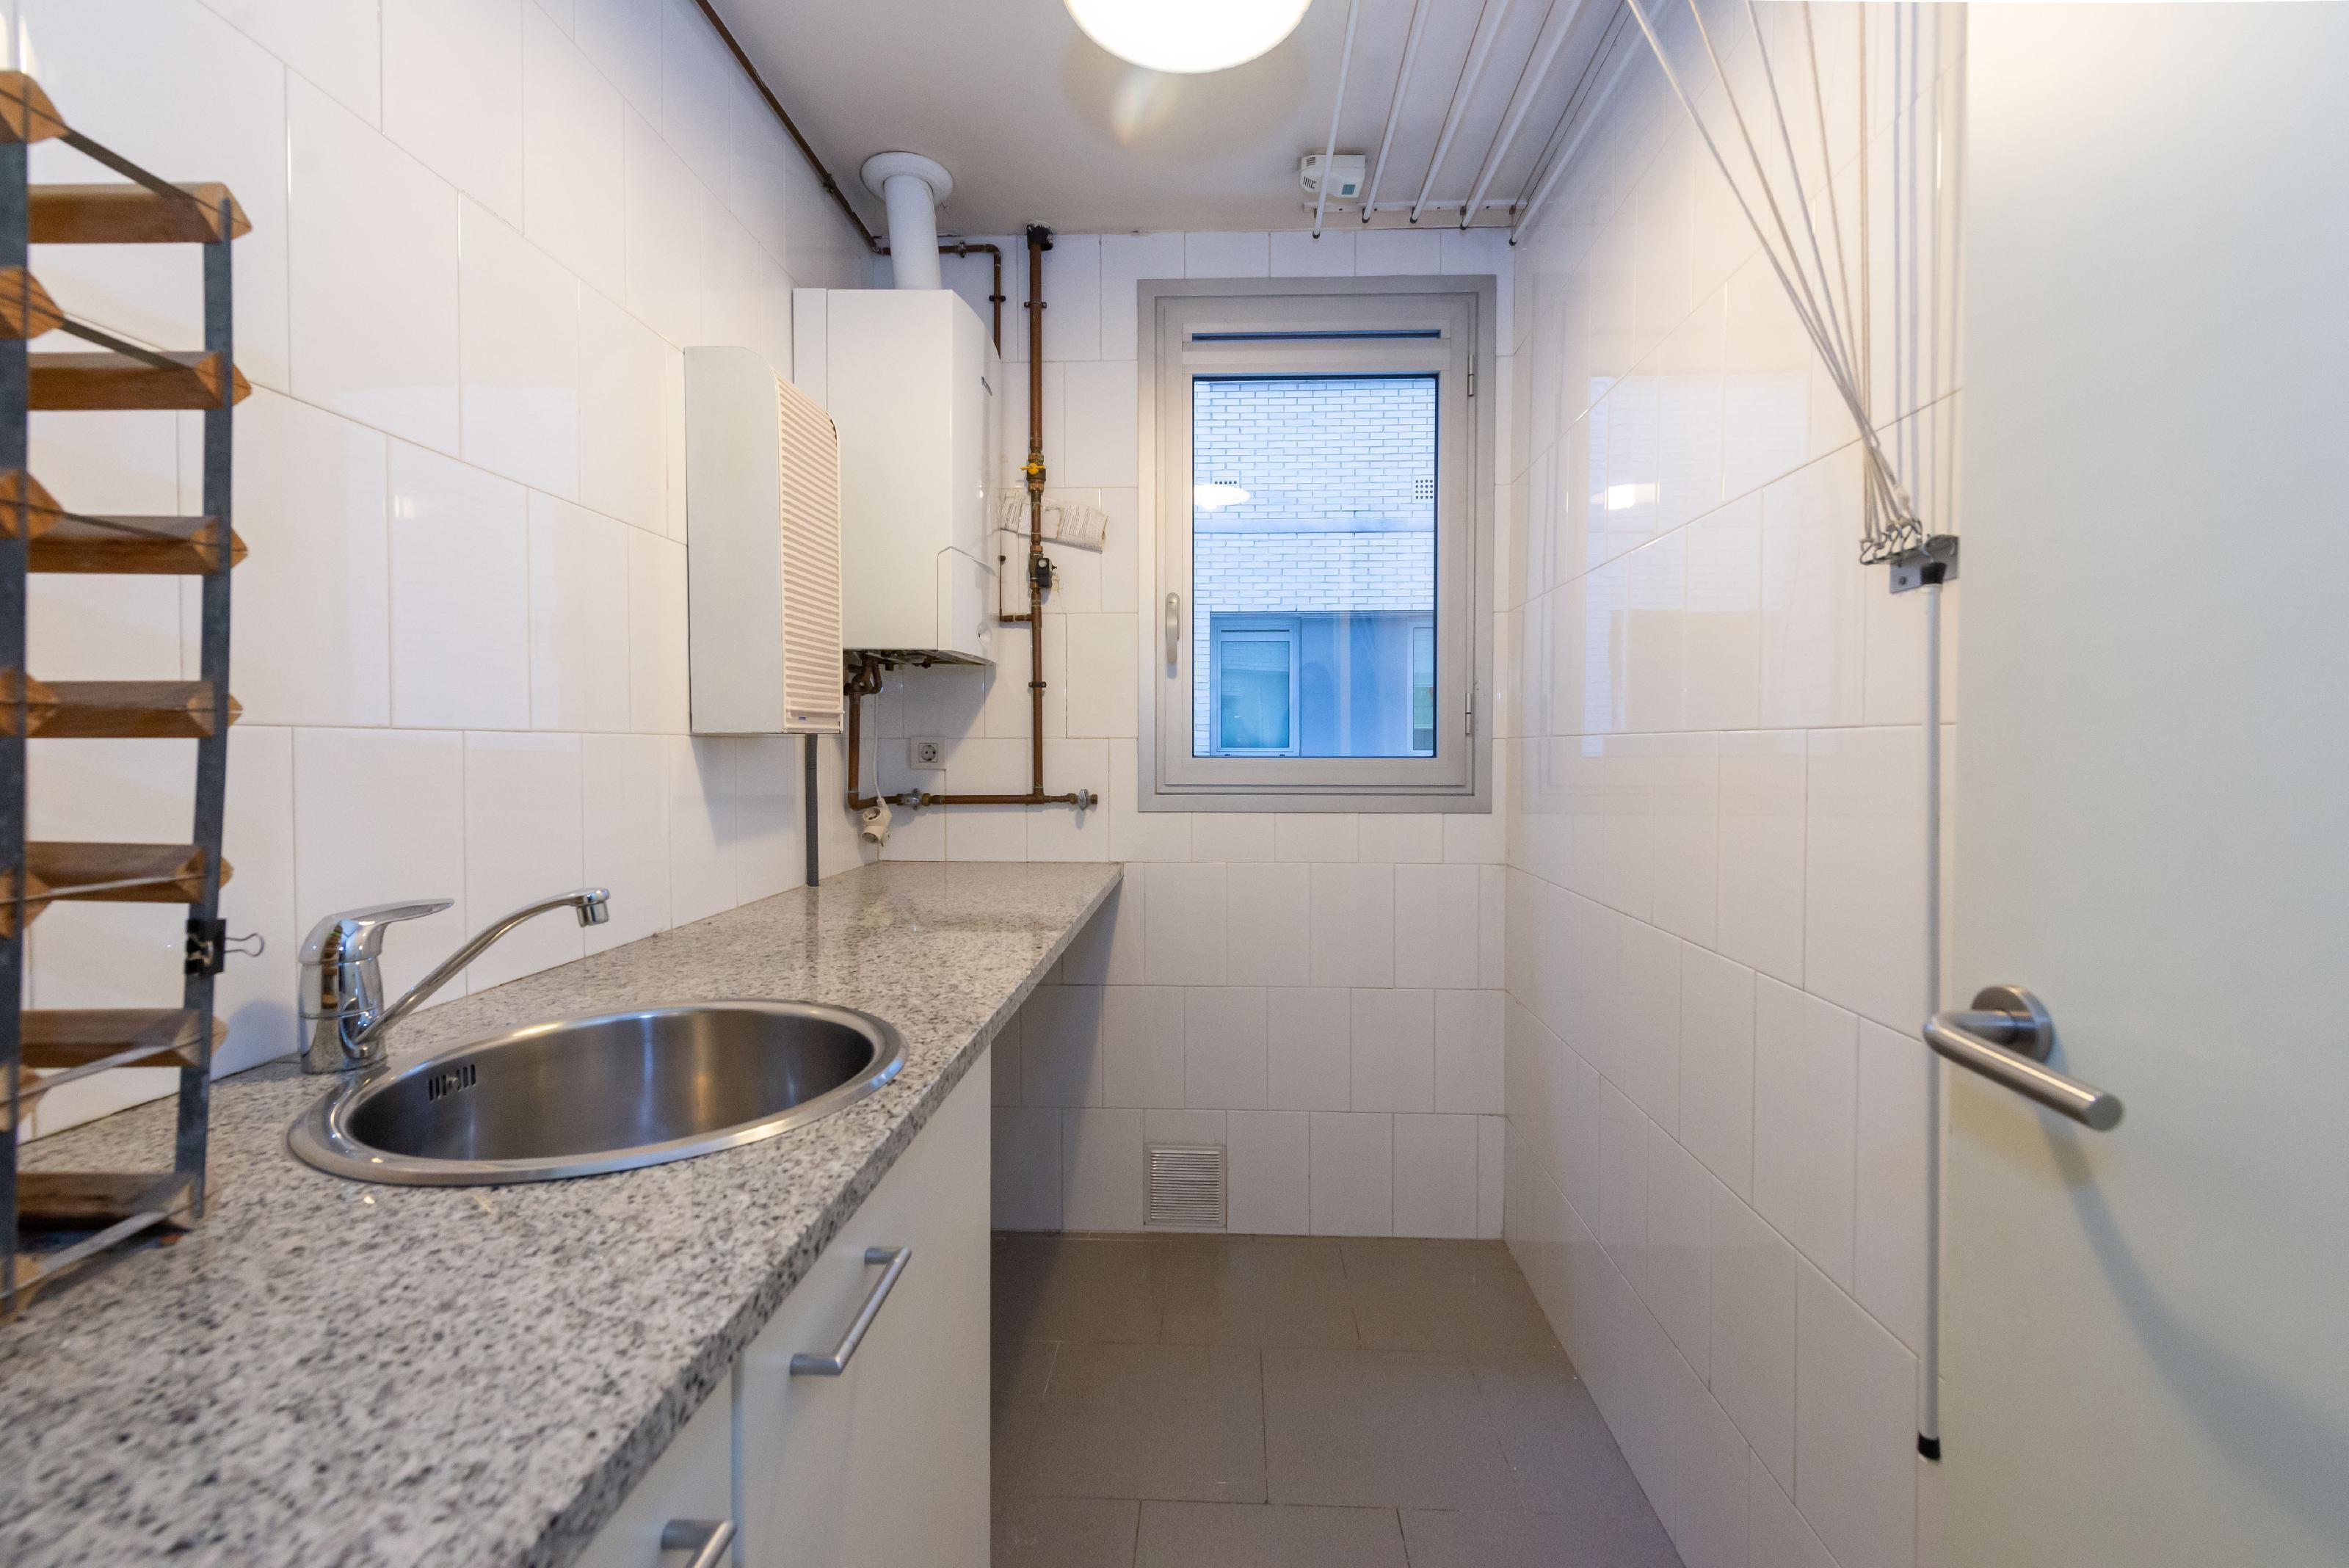 246281 Flat for sale in Sarrià-Sant Gervasi, Tres Torres 17